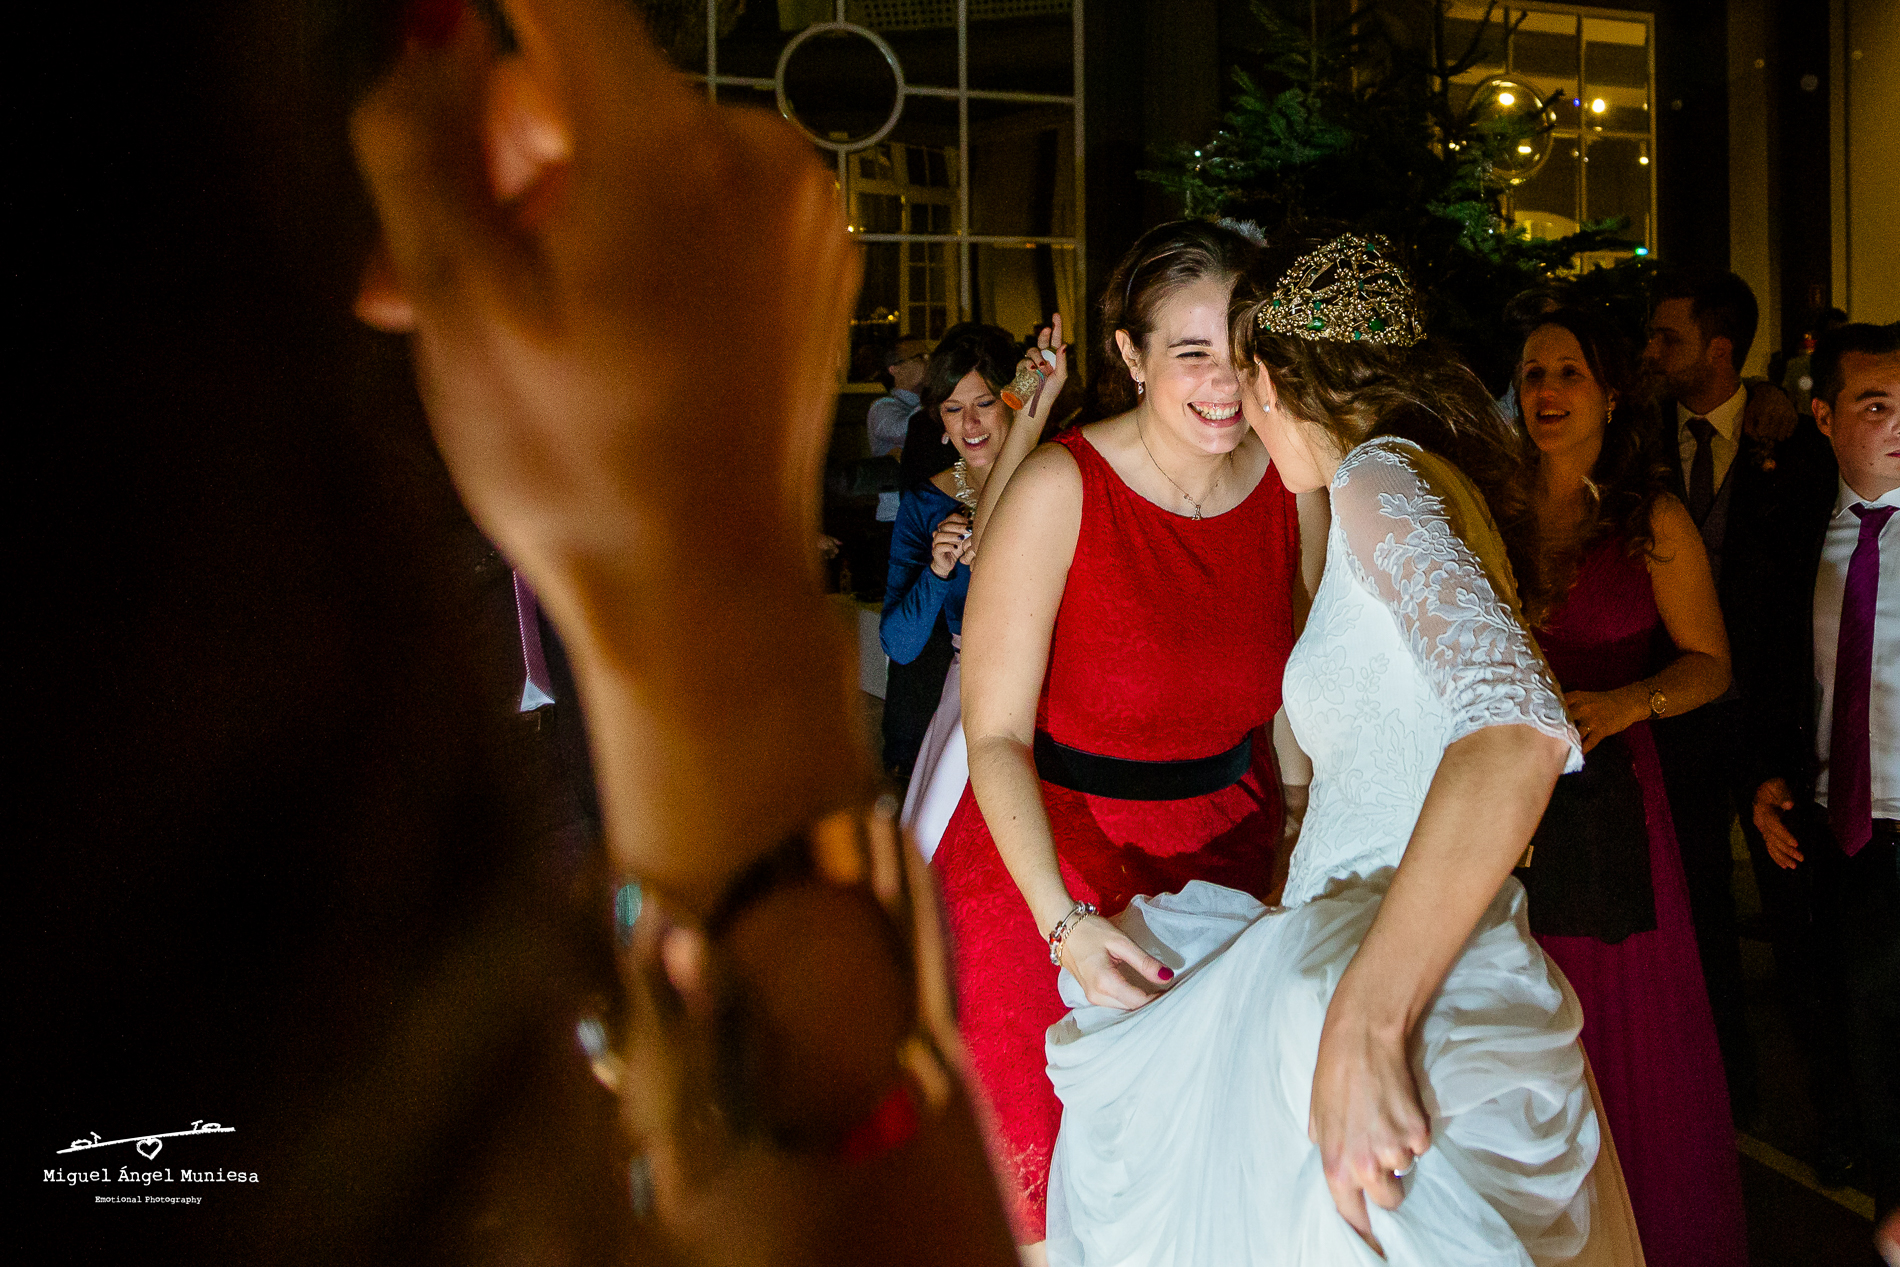 miguel angel muniesa, fotografo boda Teruel, fotografo boda navarra, fotografo boda zaragoza, fotografo boda soria, miguel angel muniesa emotional photography_25